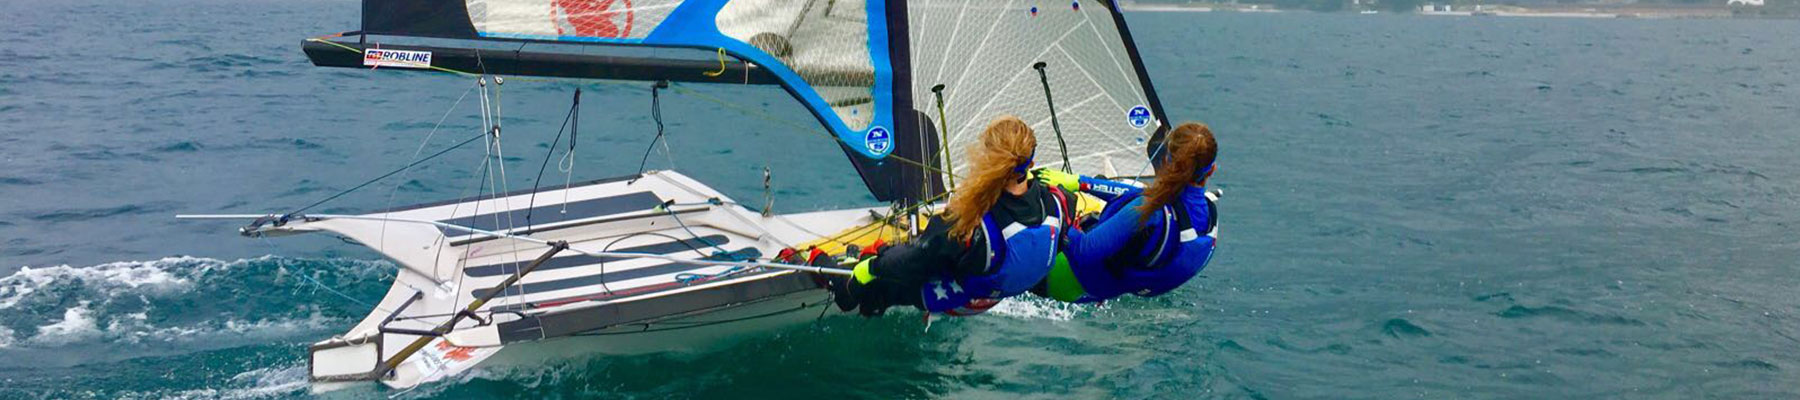 Stalder Speri Sailing Team